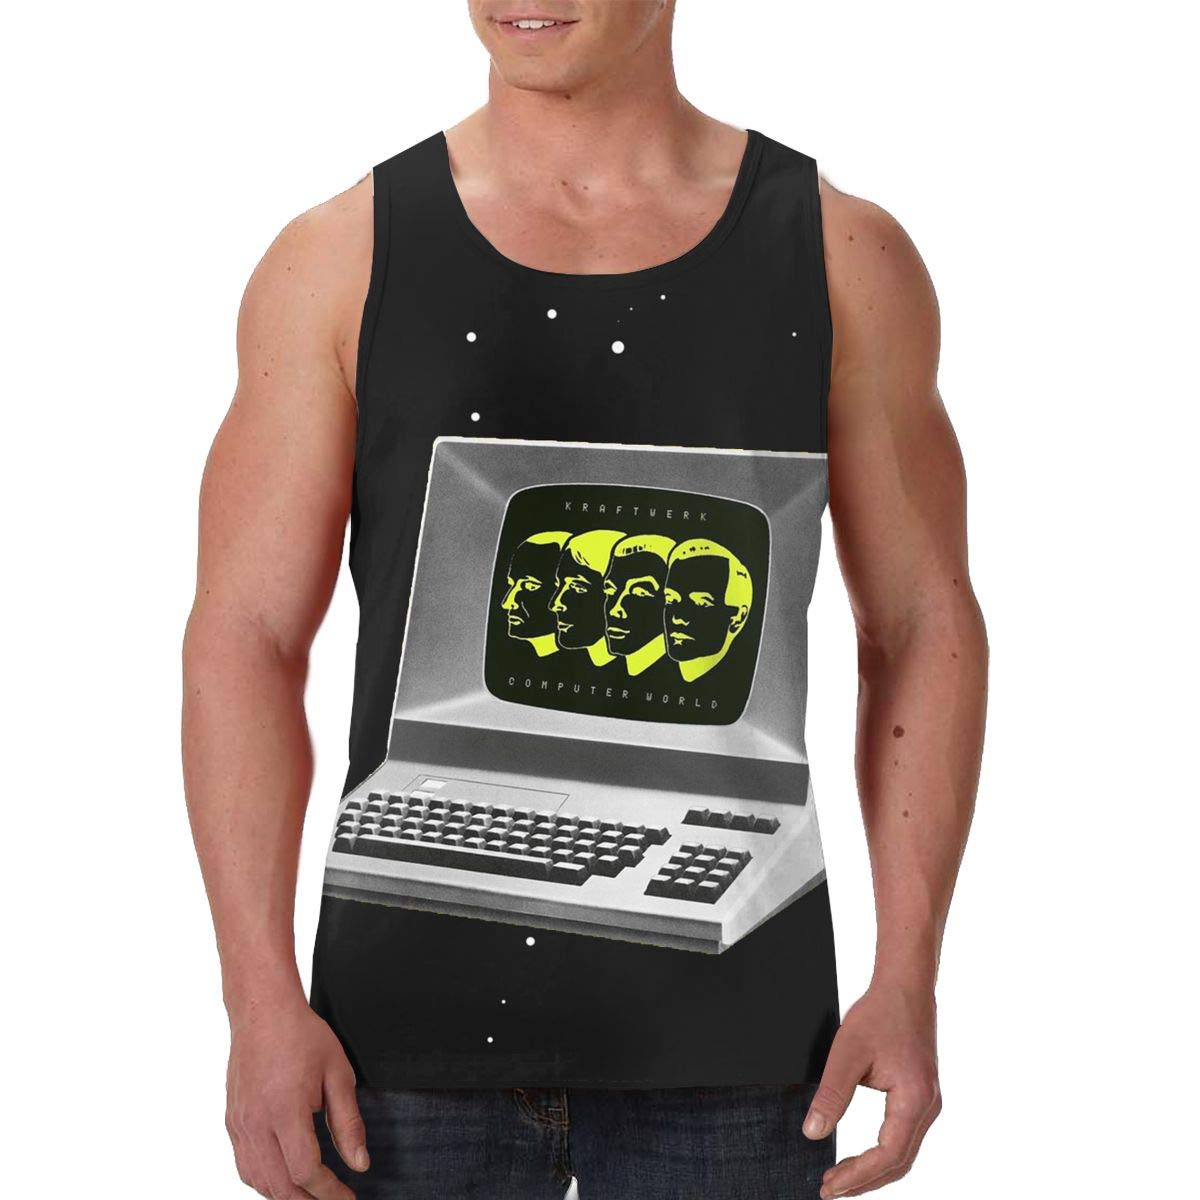 Avisn Kraftwerk Computer World Classic Sleeveless Tank Top 3004 Shirts